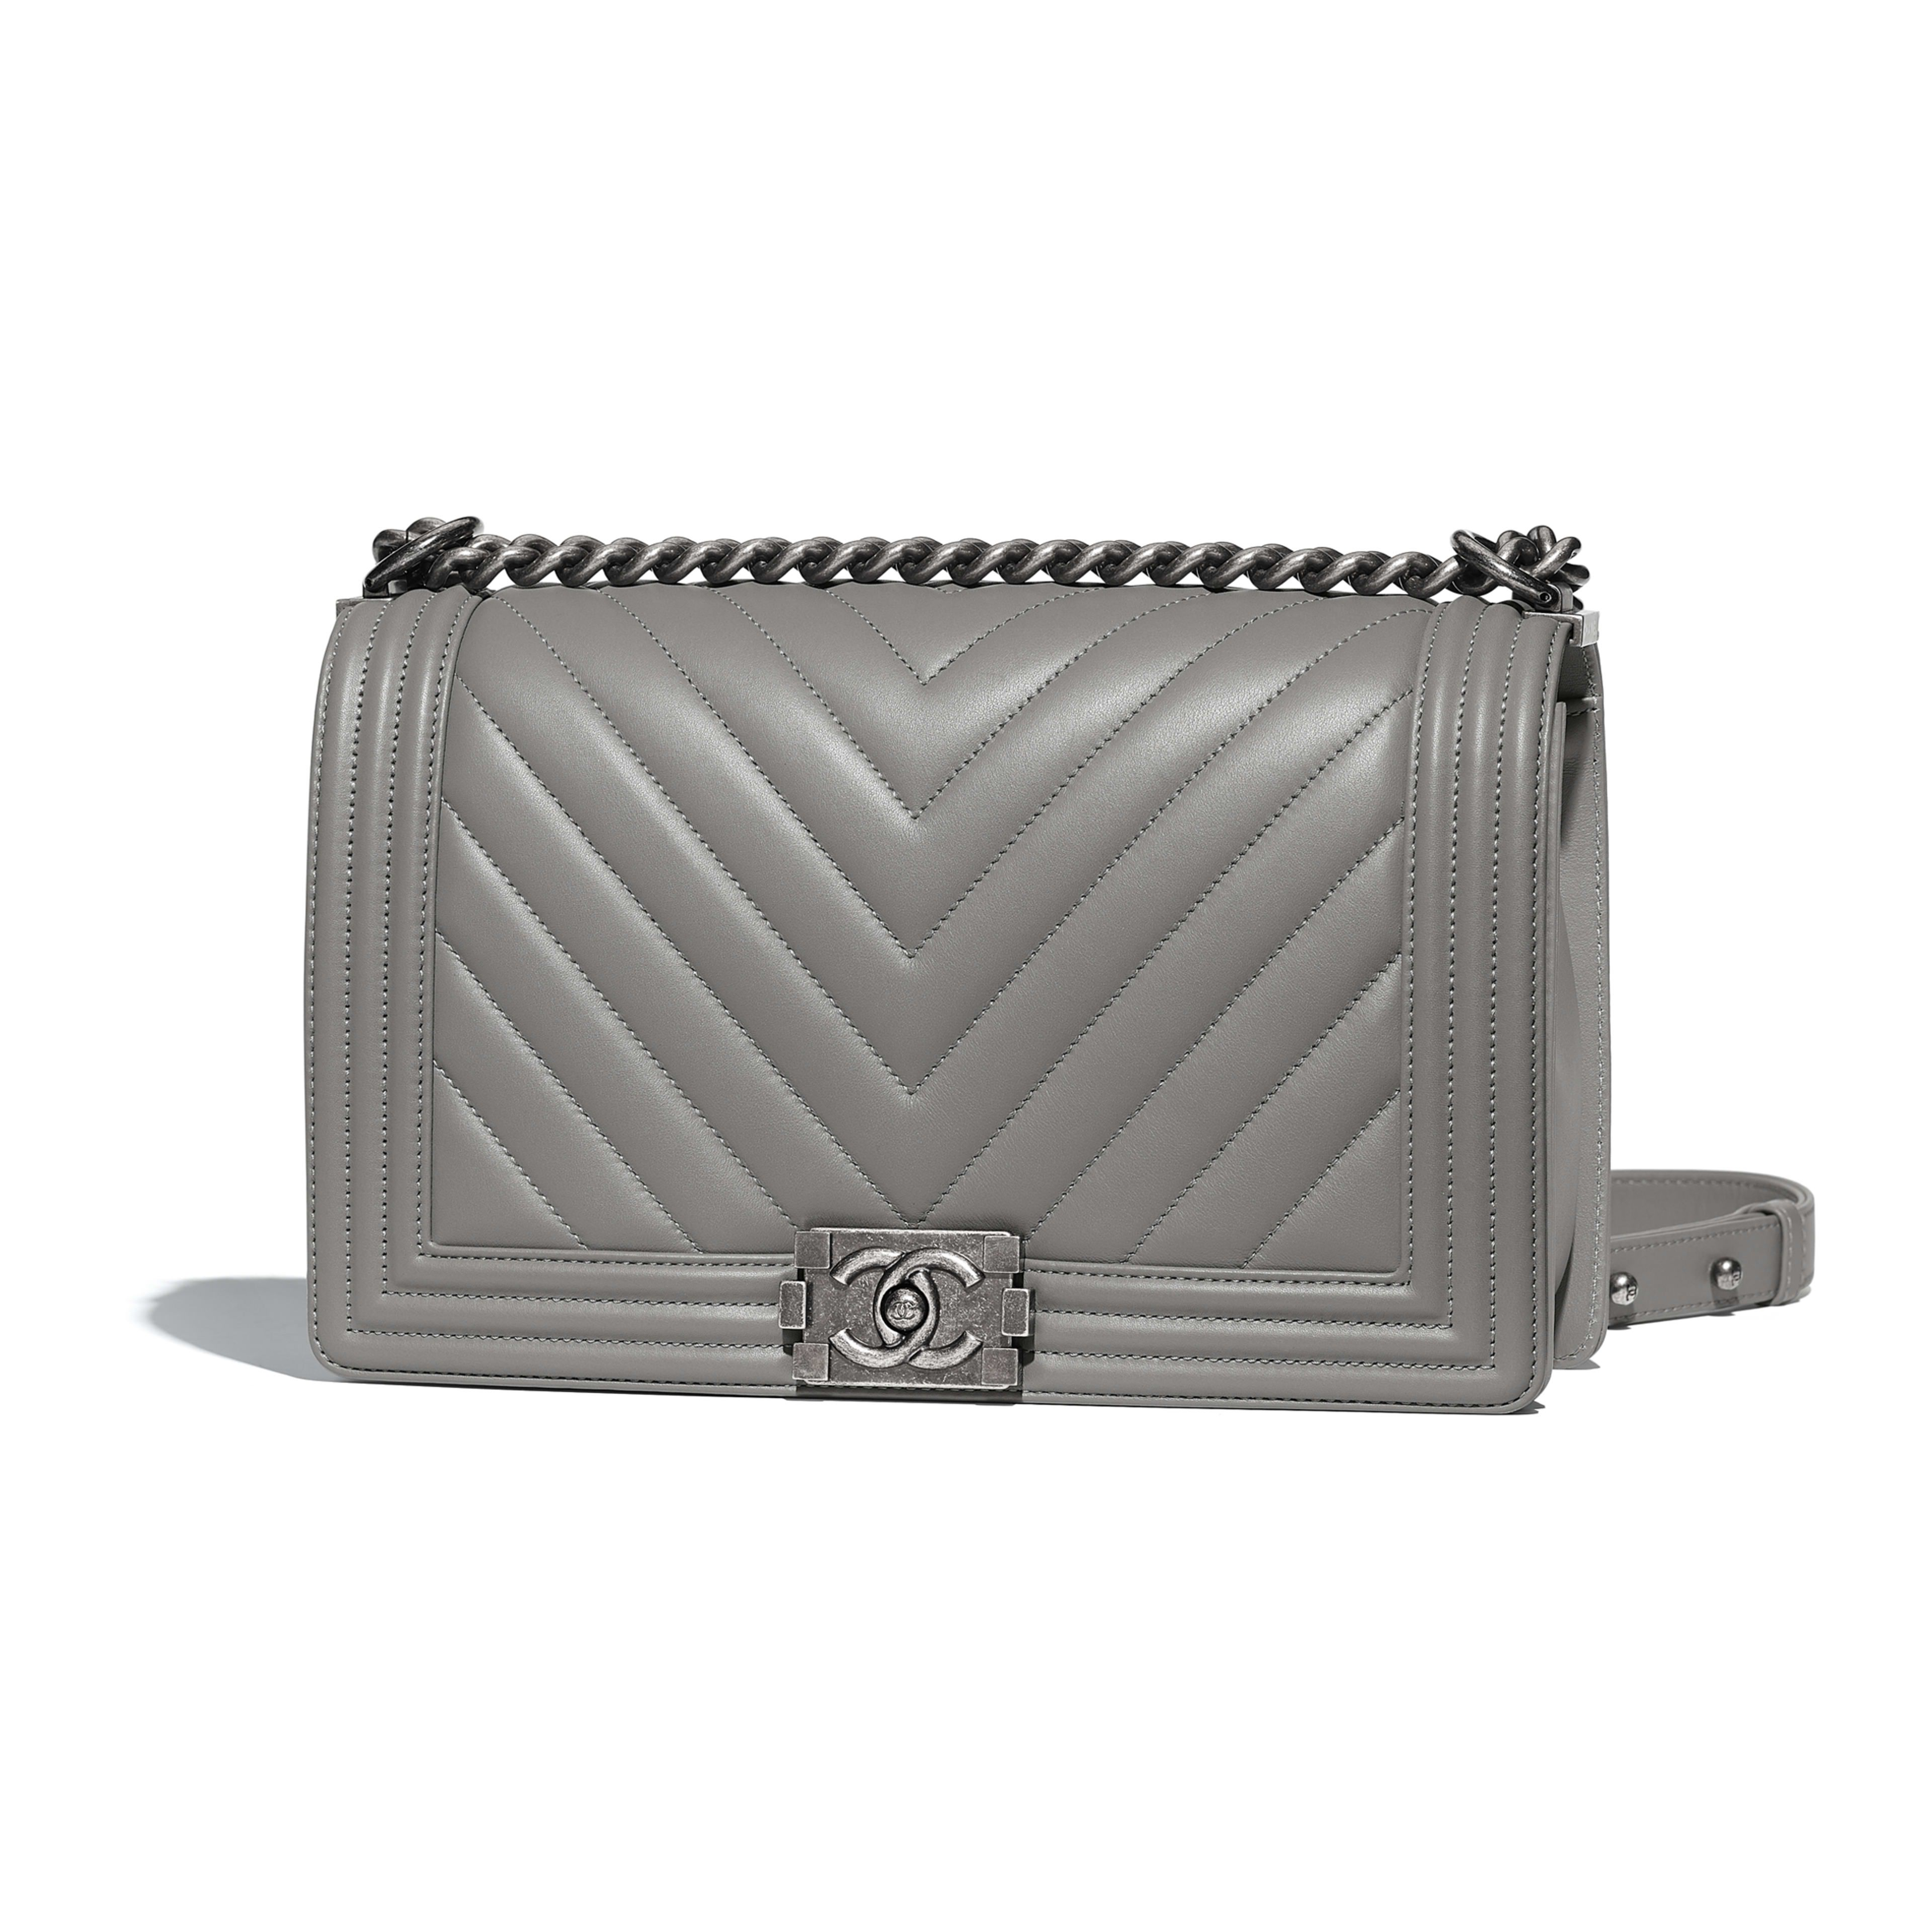 09c1128588f4 Large BOY CHANEL Handbag Calfskin & Ruthenium-Finish Metal Gray - view 1 -  see full sized version